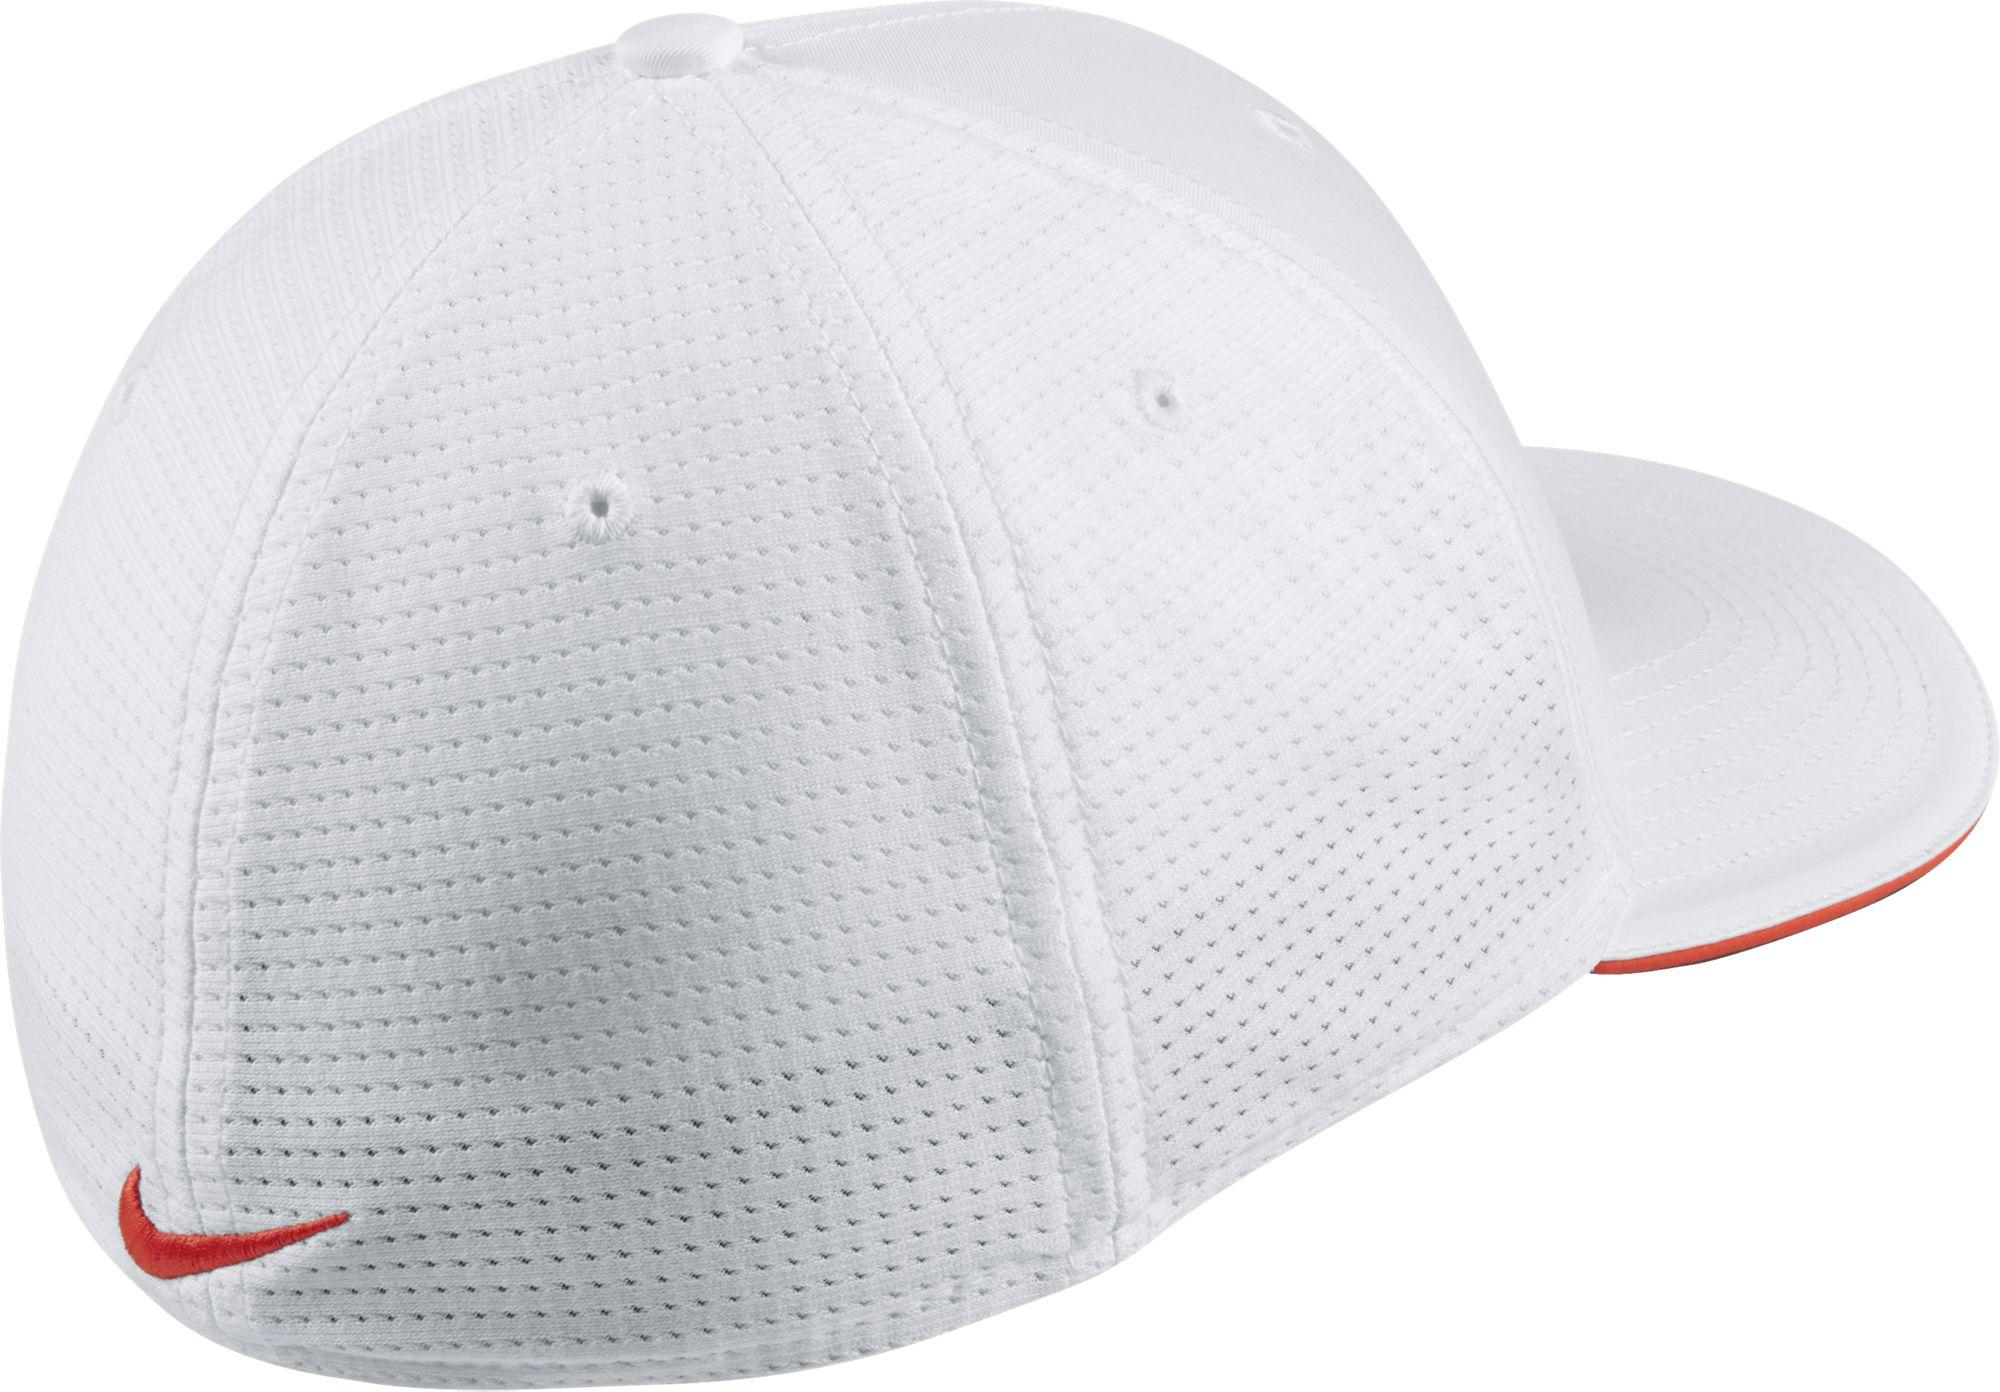 e4f3015eb6ce4 Nike Golf 2017 Classic 99 Mesh Fitted Cap Hat 848052 - Pick Color ...